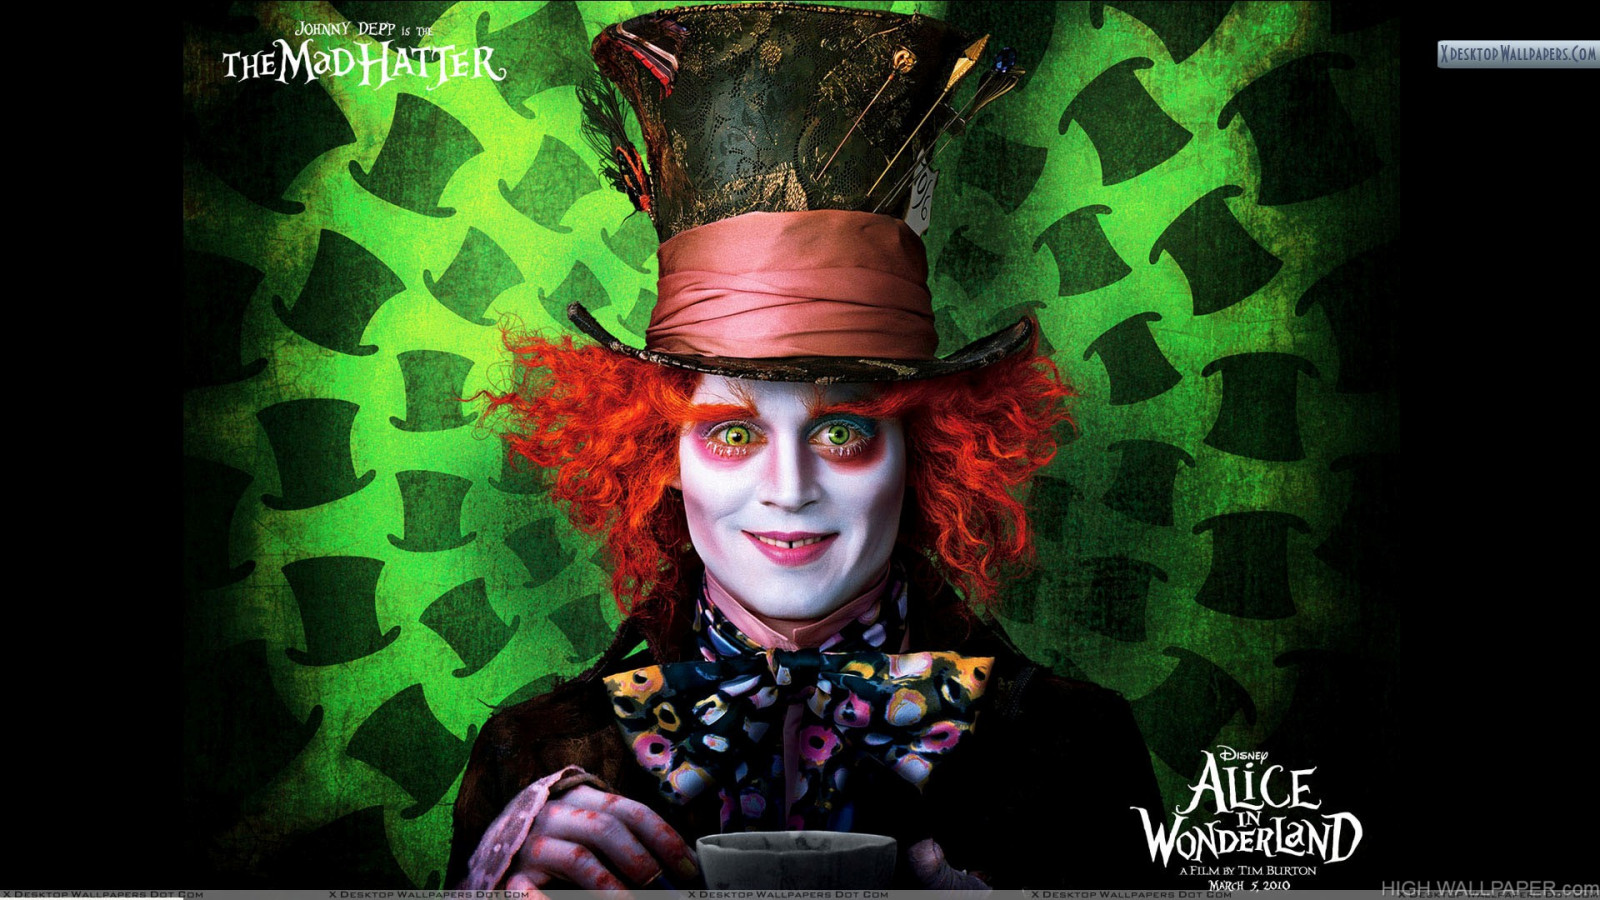 alice in wonderland johnny depp smiling hd wallpaper